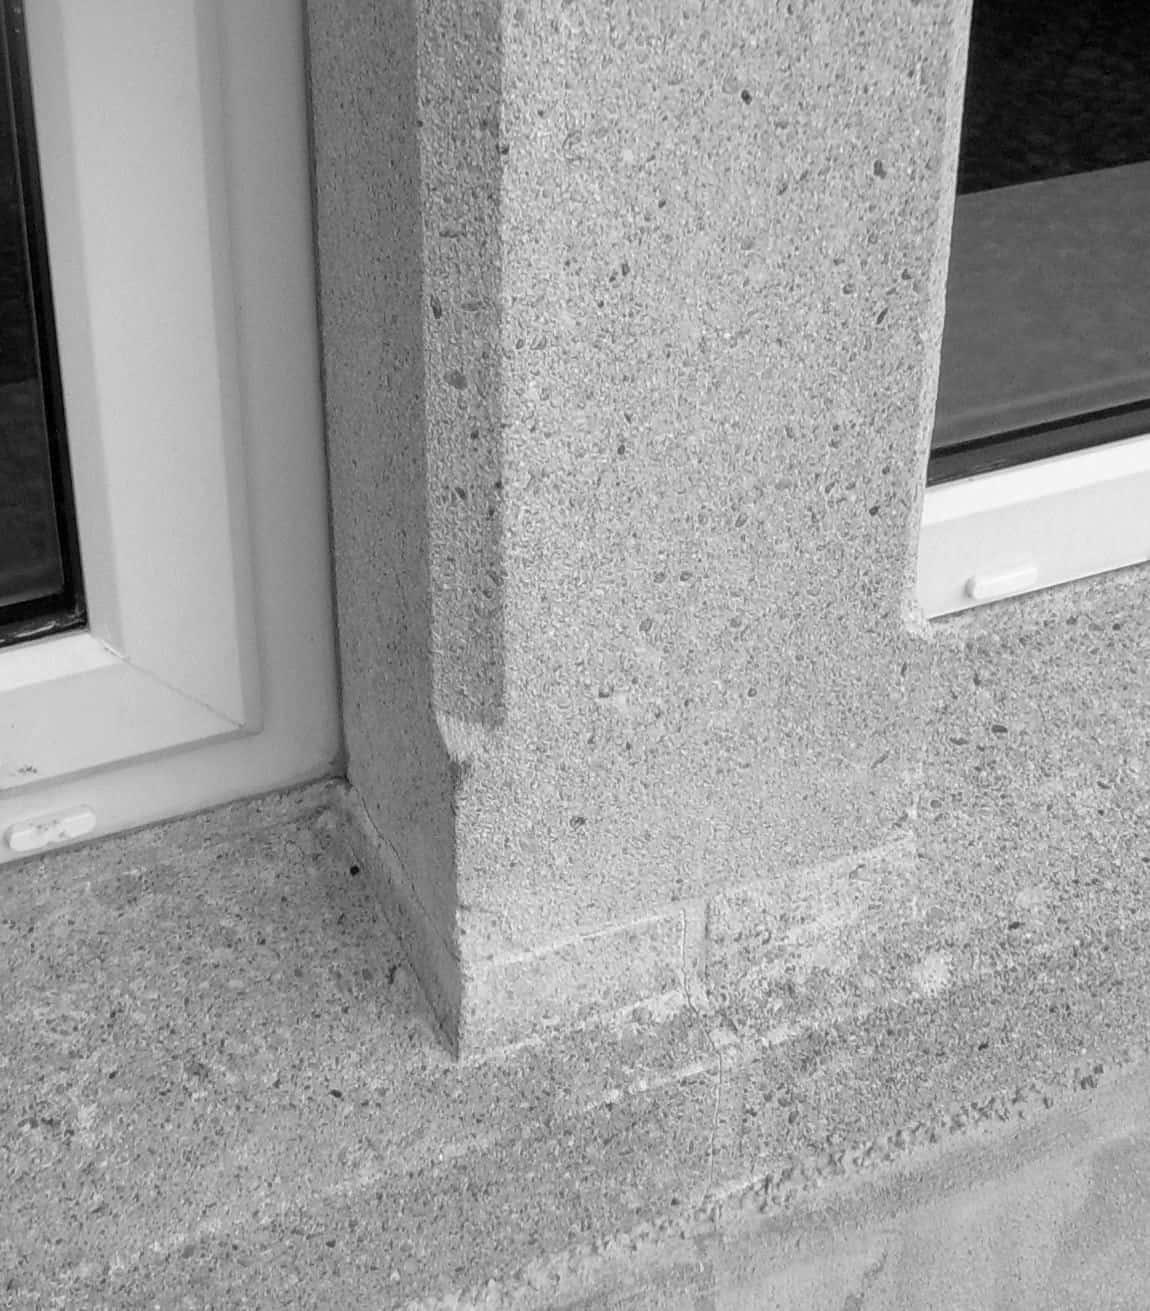 Wilson Dwelling - View of Stone Window Cills